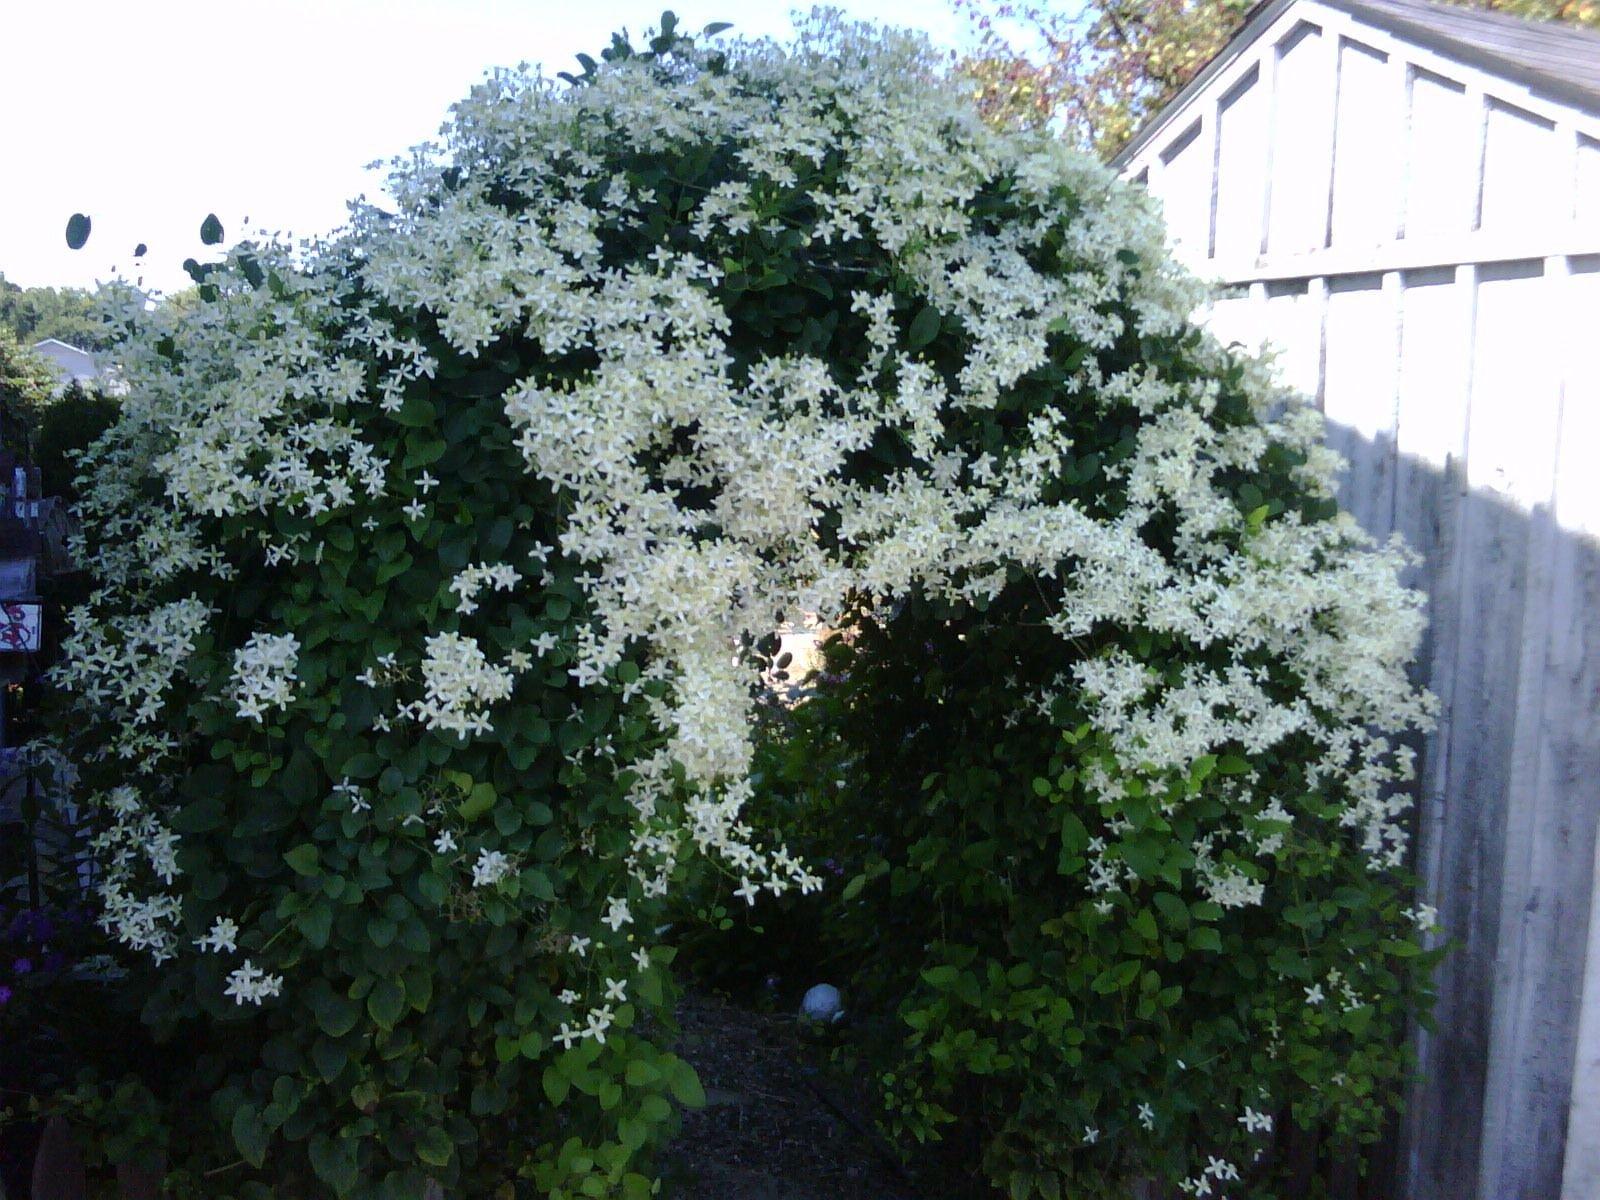 Hirt's Gardens Sweet Autumn Clematis Vine - Clematis paniculata - Fragrant - 2.5'' Pot